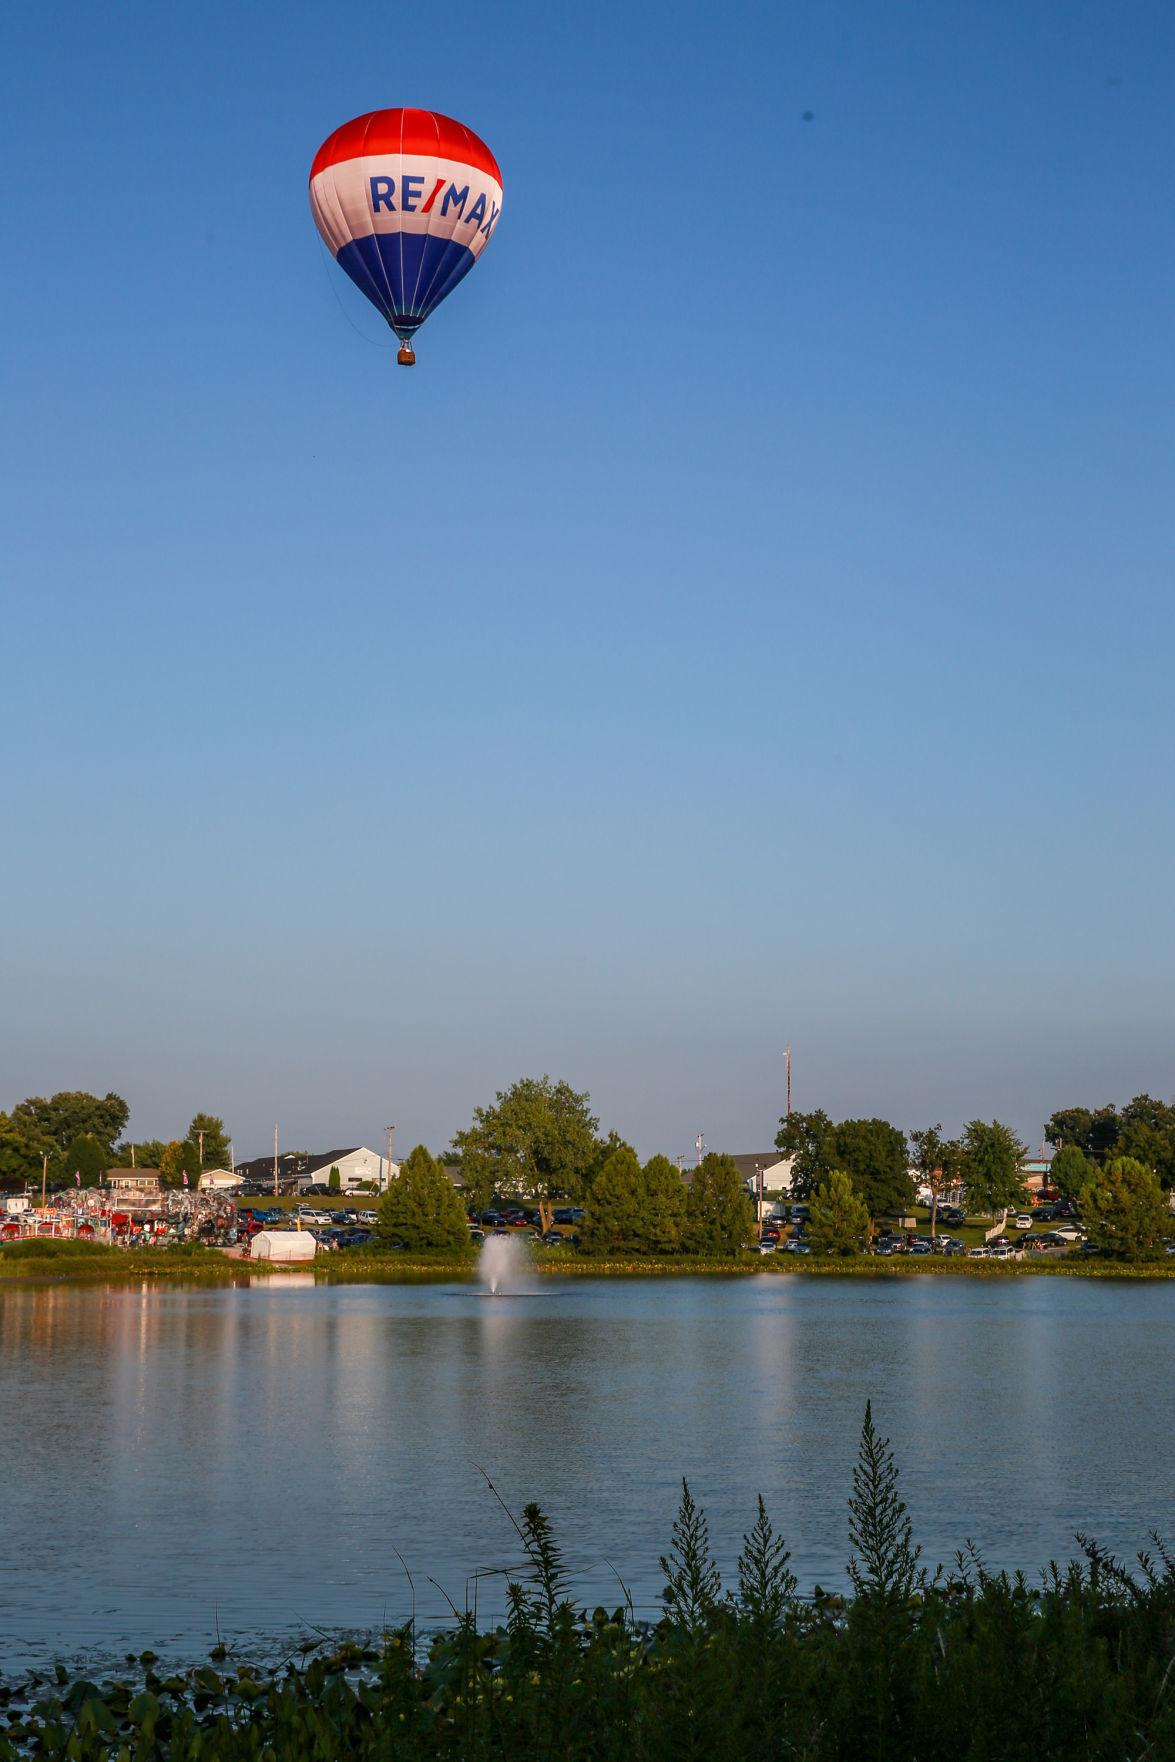 Fair attendance and a balloon ride